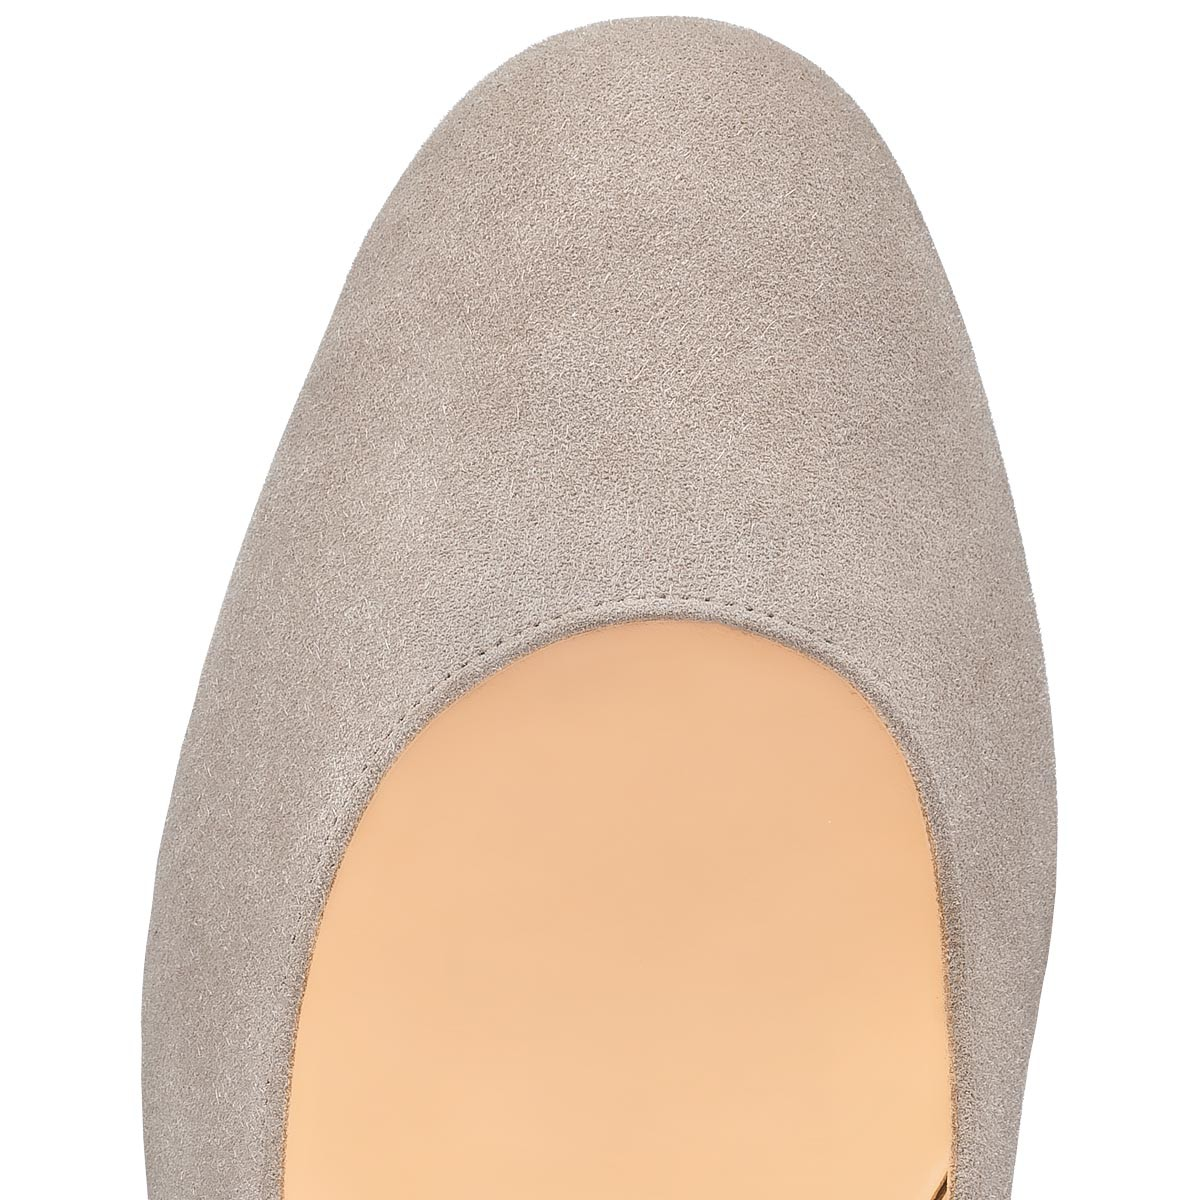 Shoes - Miss Sab - Christian Louboutin